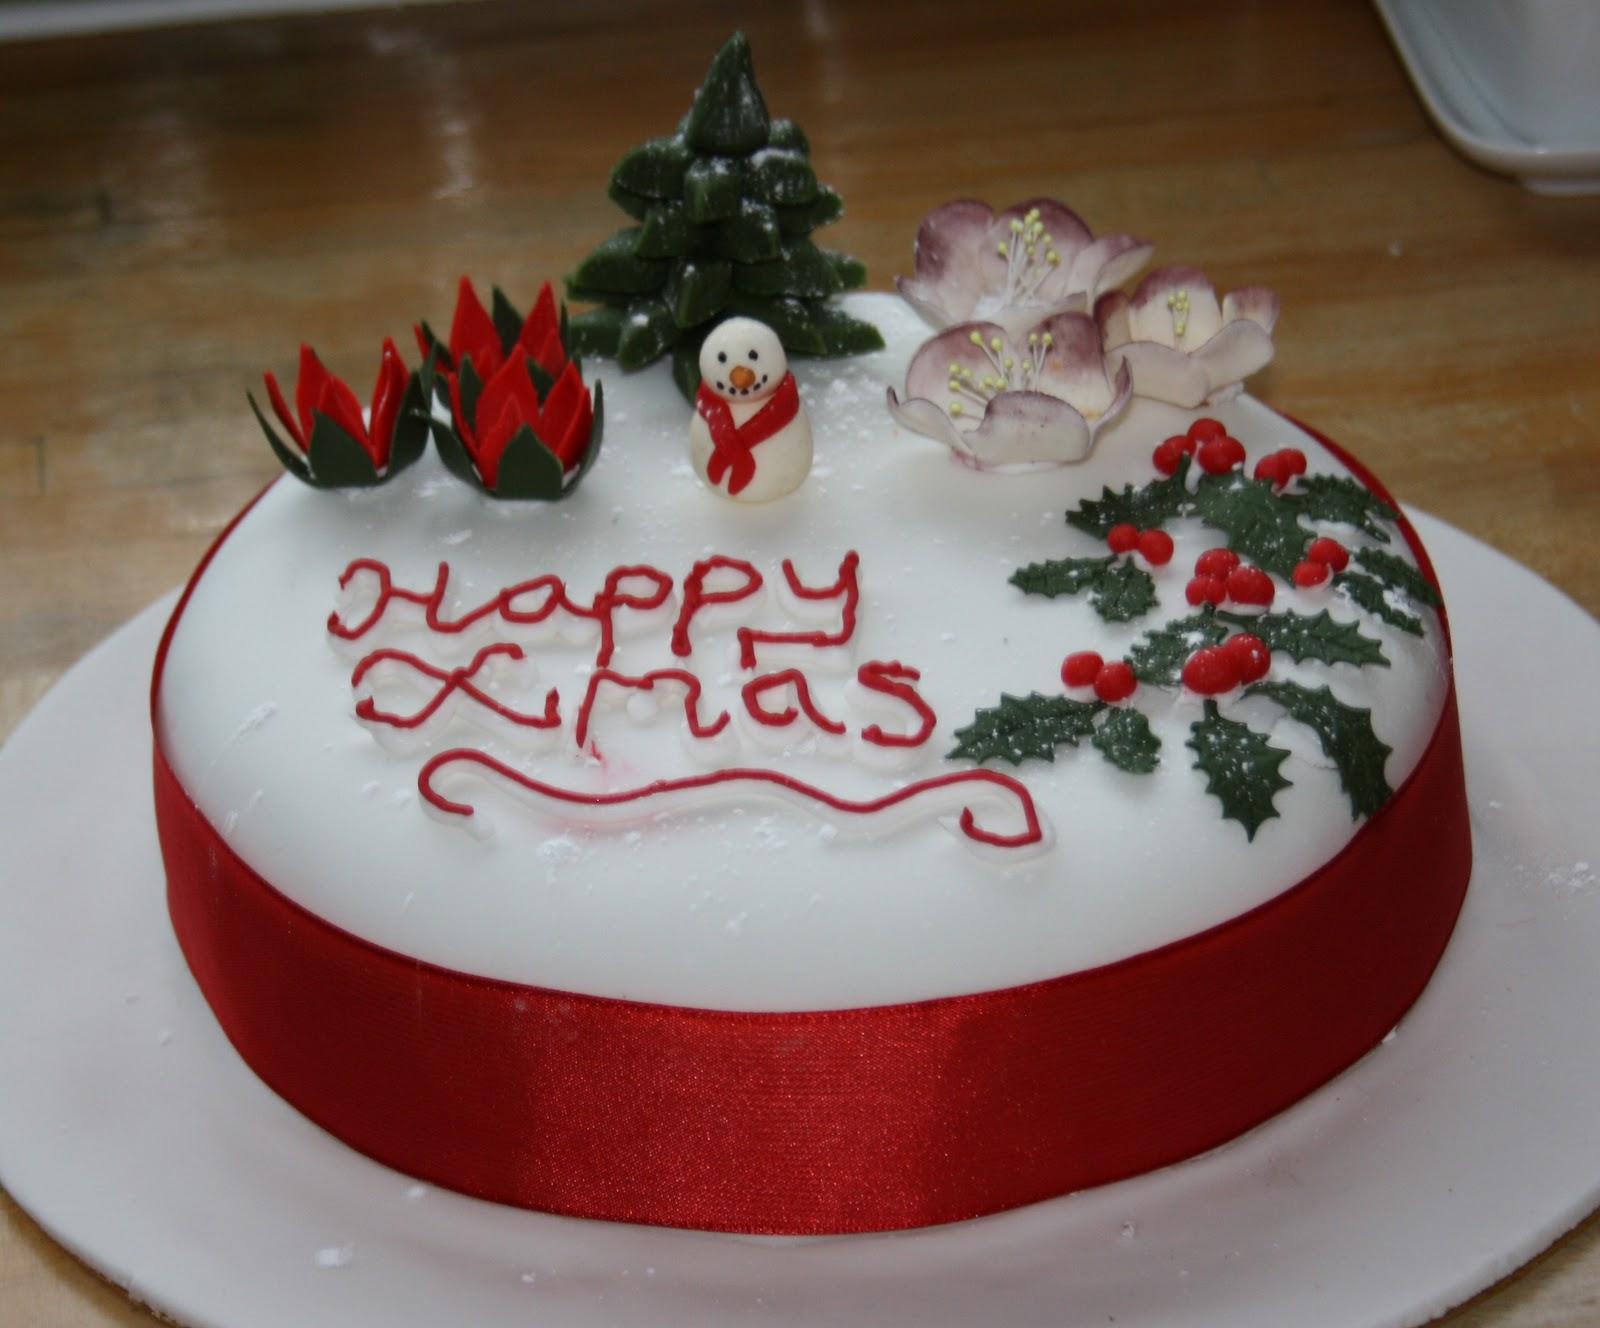 Christmas Cake Royal Icing Decorating Ideas : Decorating the Christmas Cake Bex in Sugarland